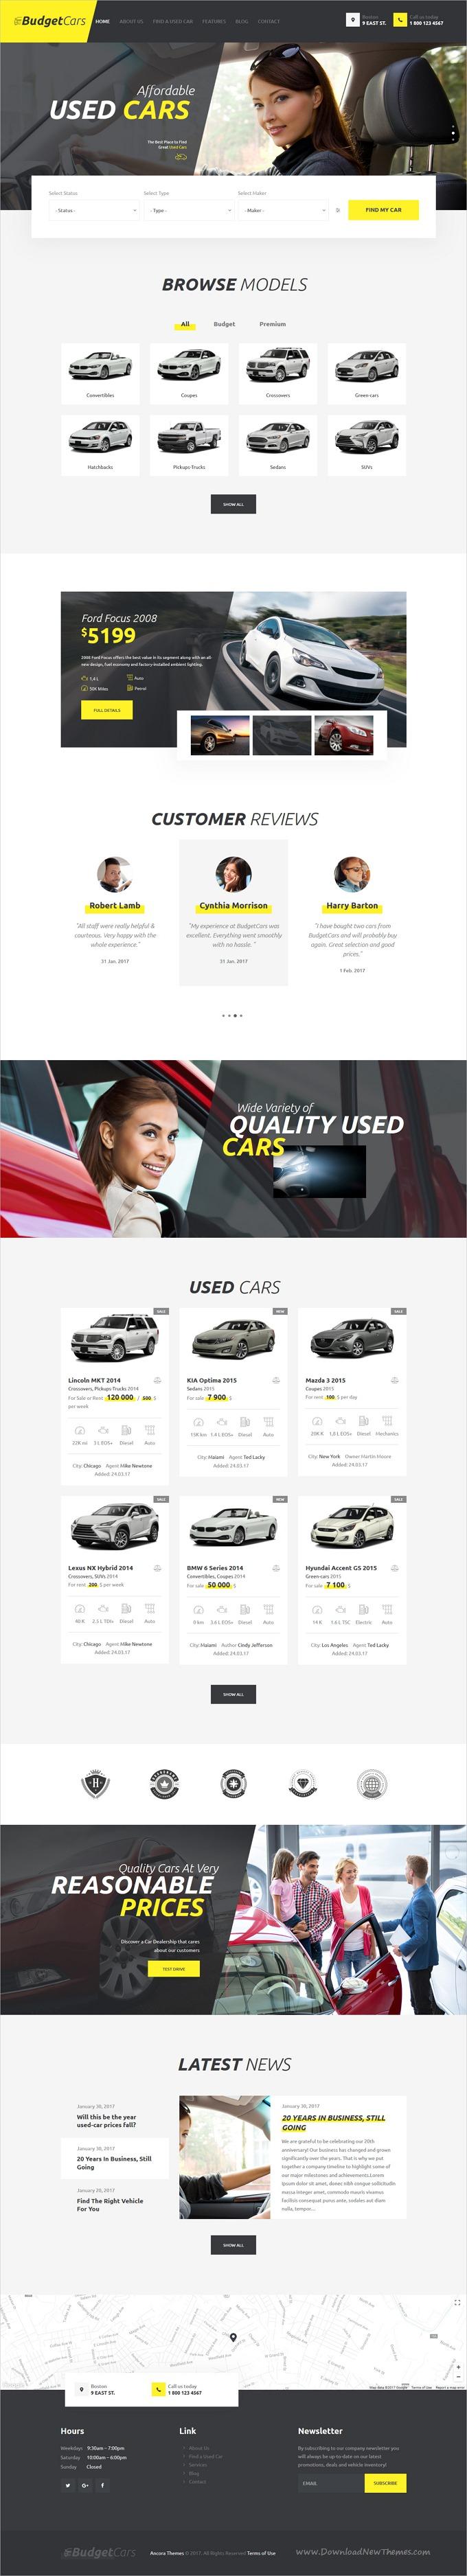 Budget Cars Used Car Dealer & Rental WordPress Theme